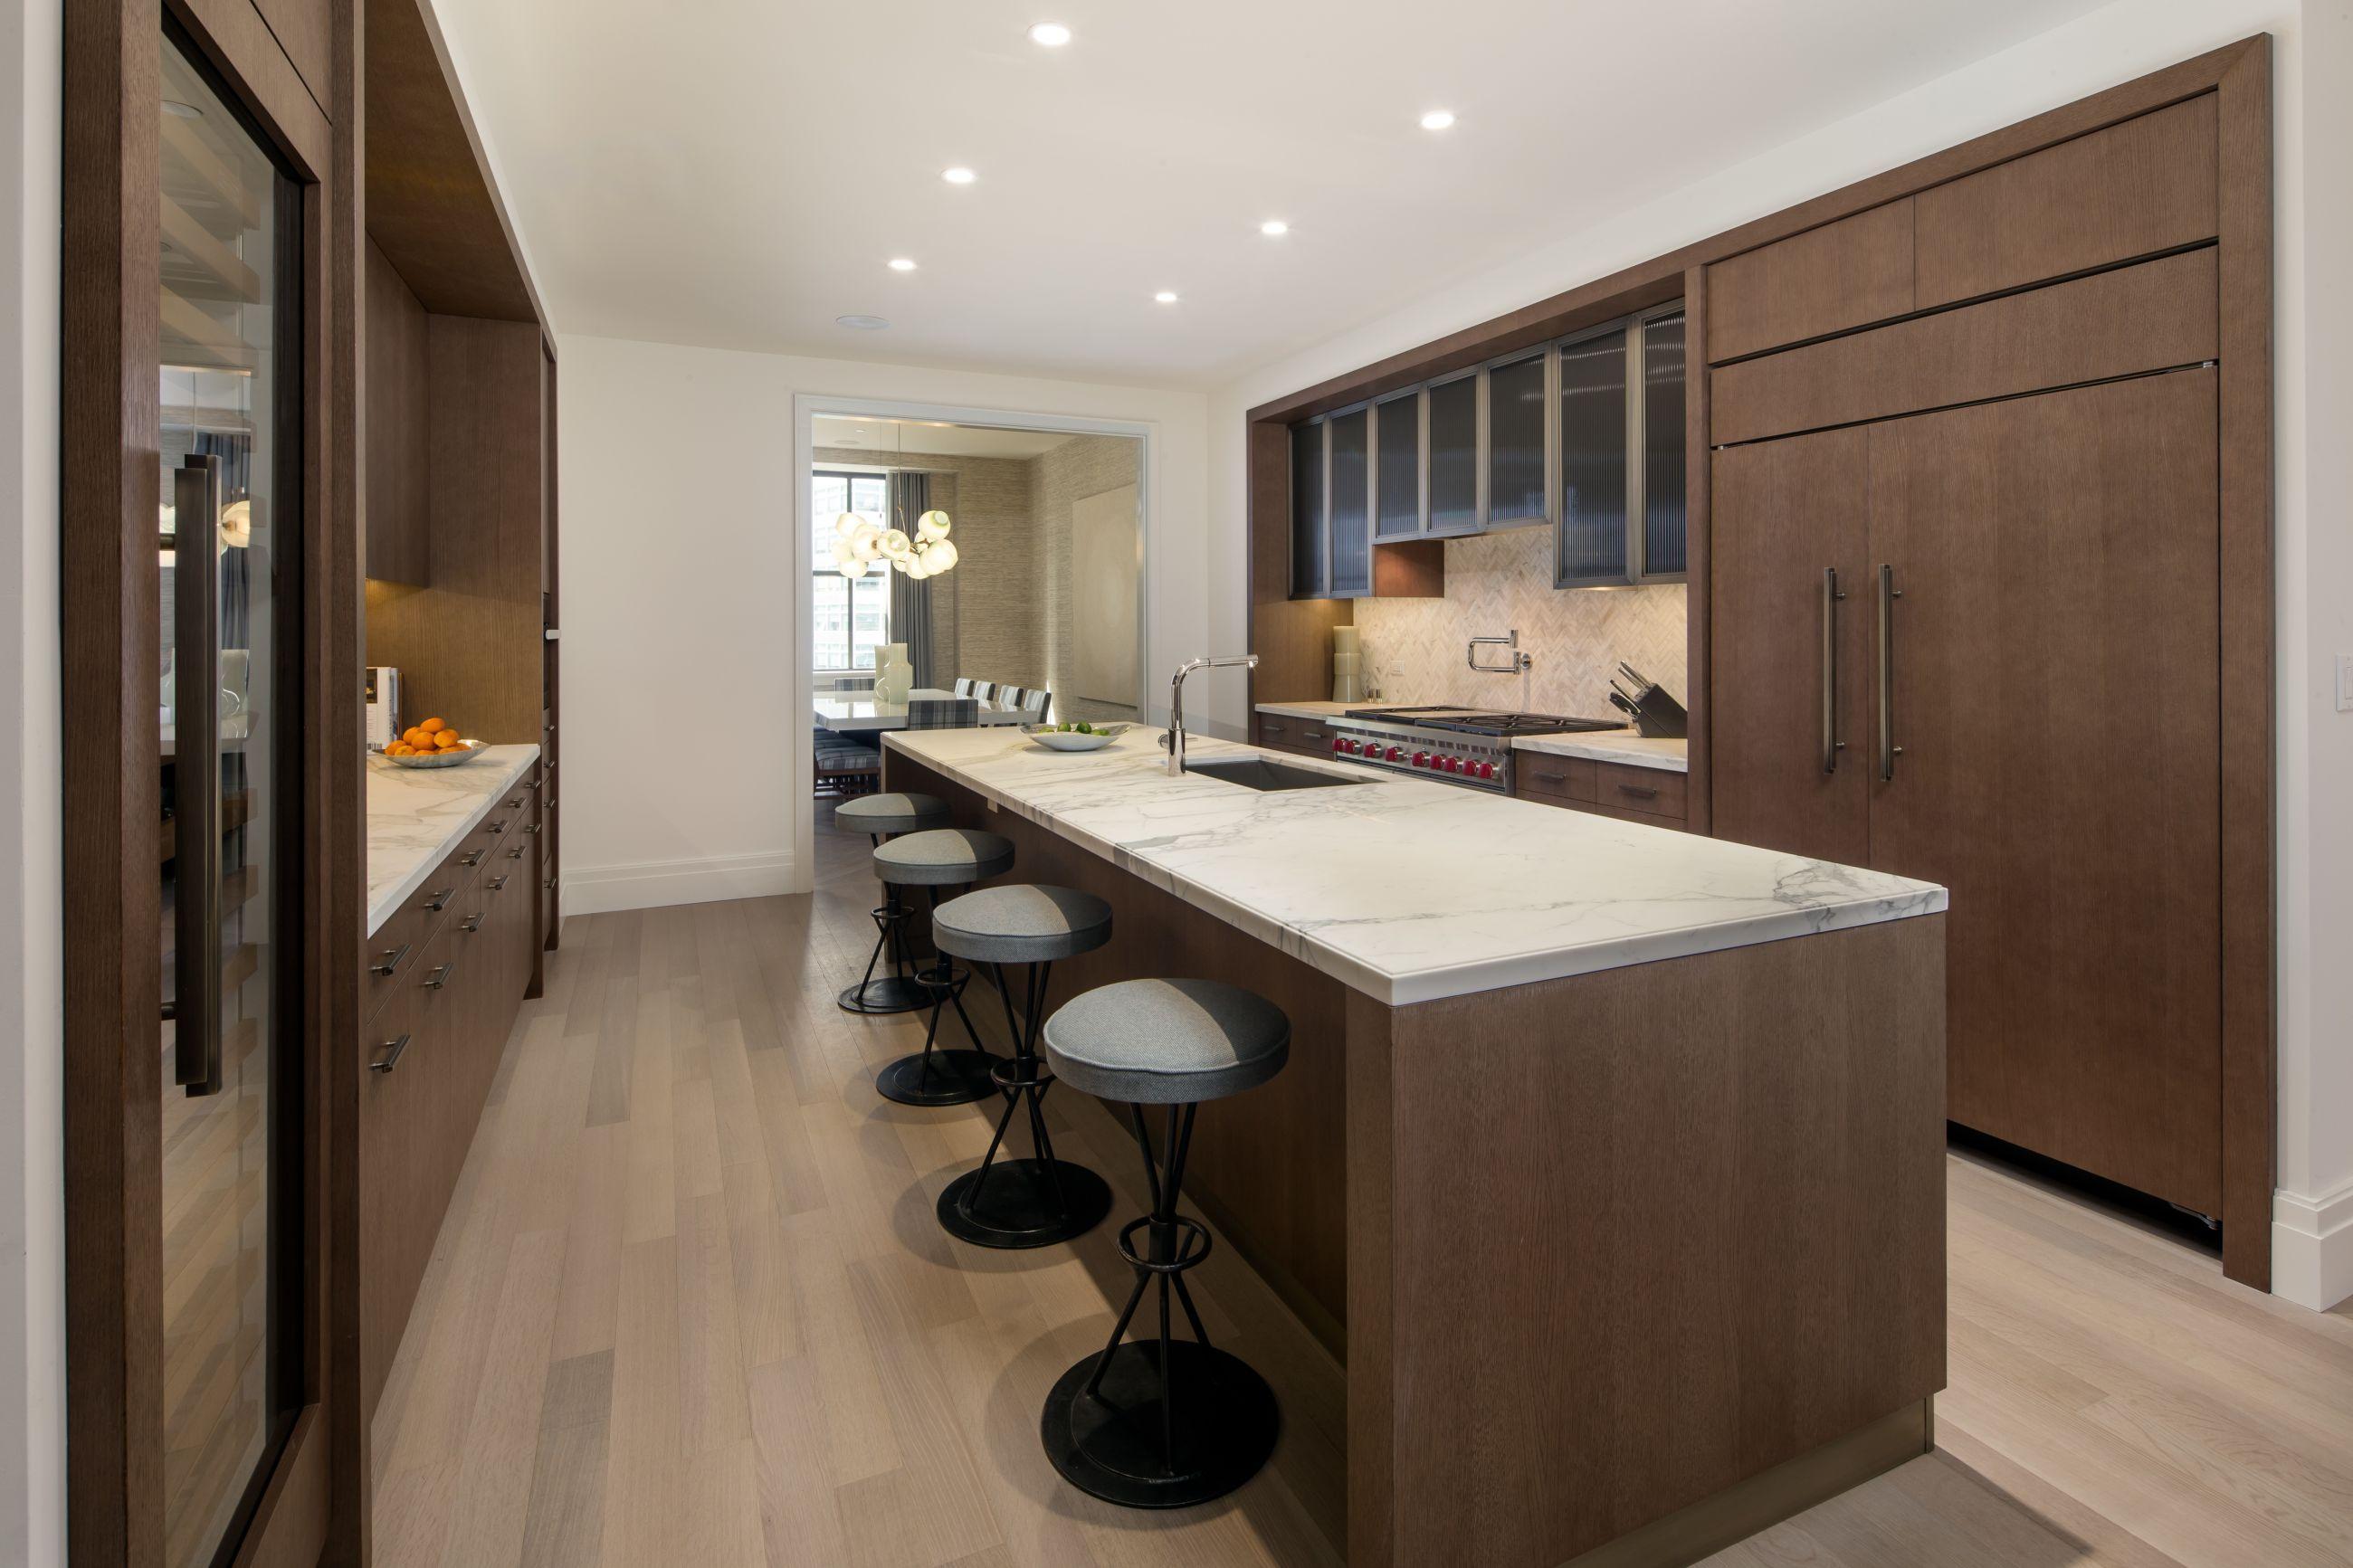 Ralph Walker Model  Kitchen  Grade New York  Grade Apartments Awesome New Model Kitchen Design 2018